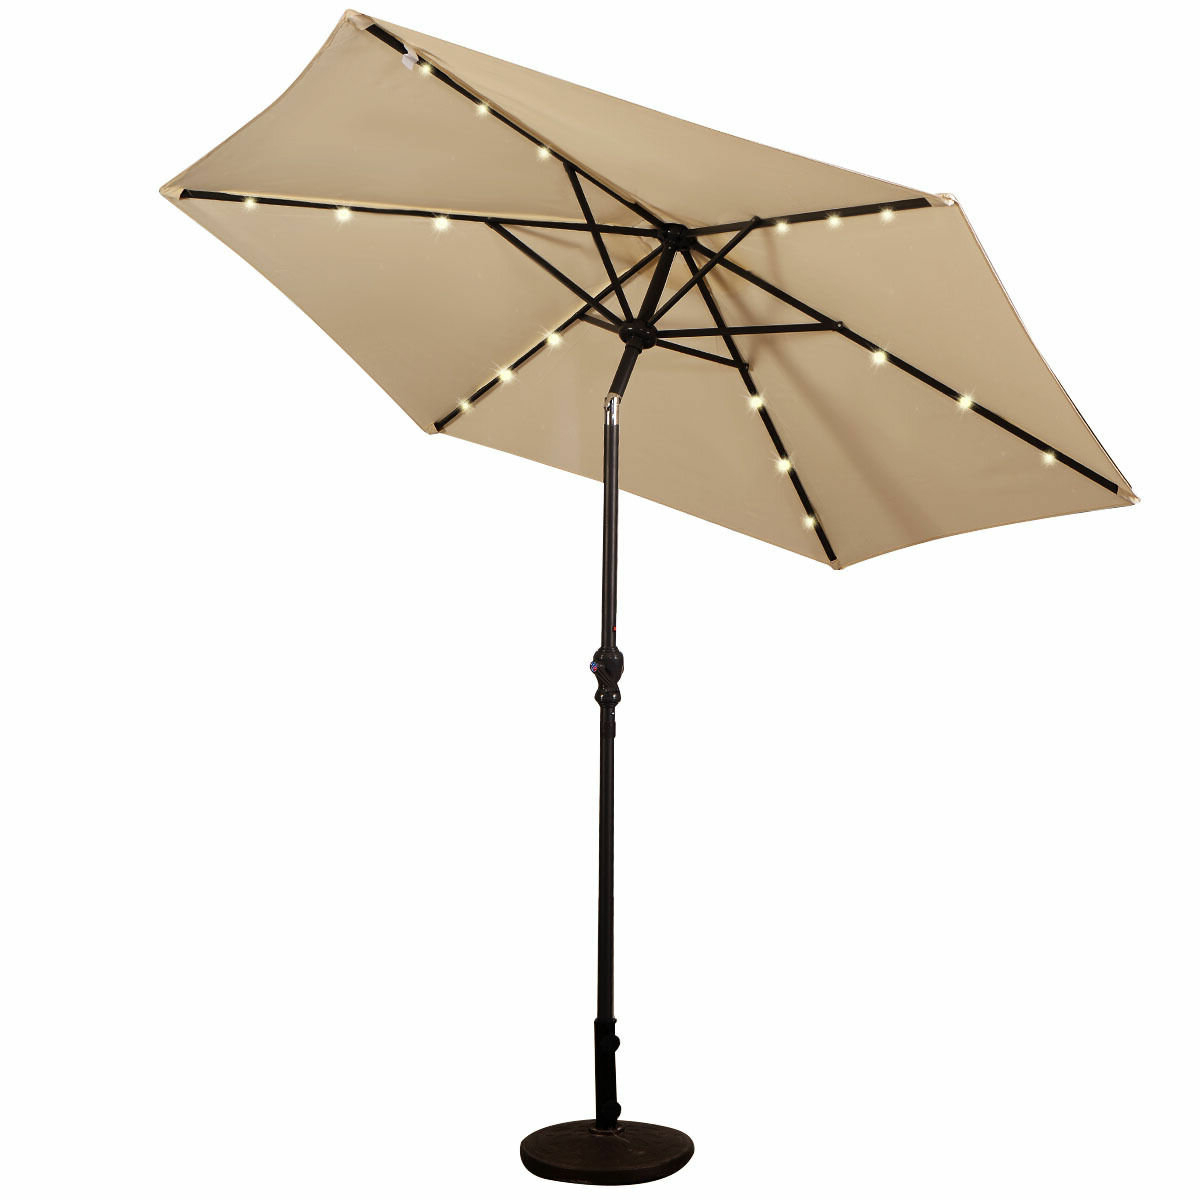 Freeport Park Eastwood 9' Market Umbrella With Popular Branscum Lighted Umbrellas (View 19 of 20)